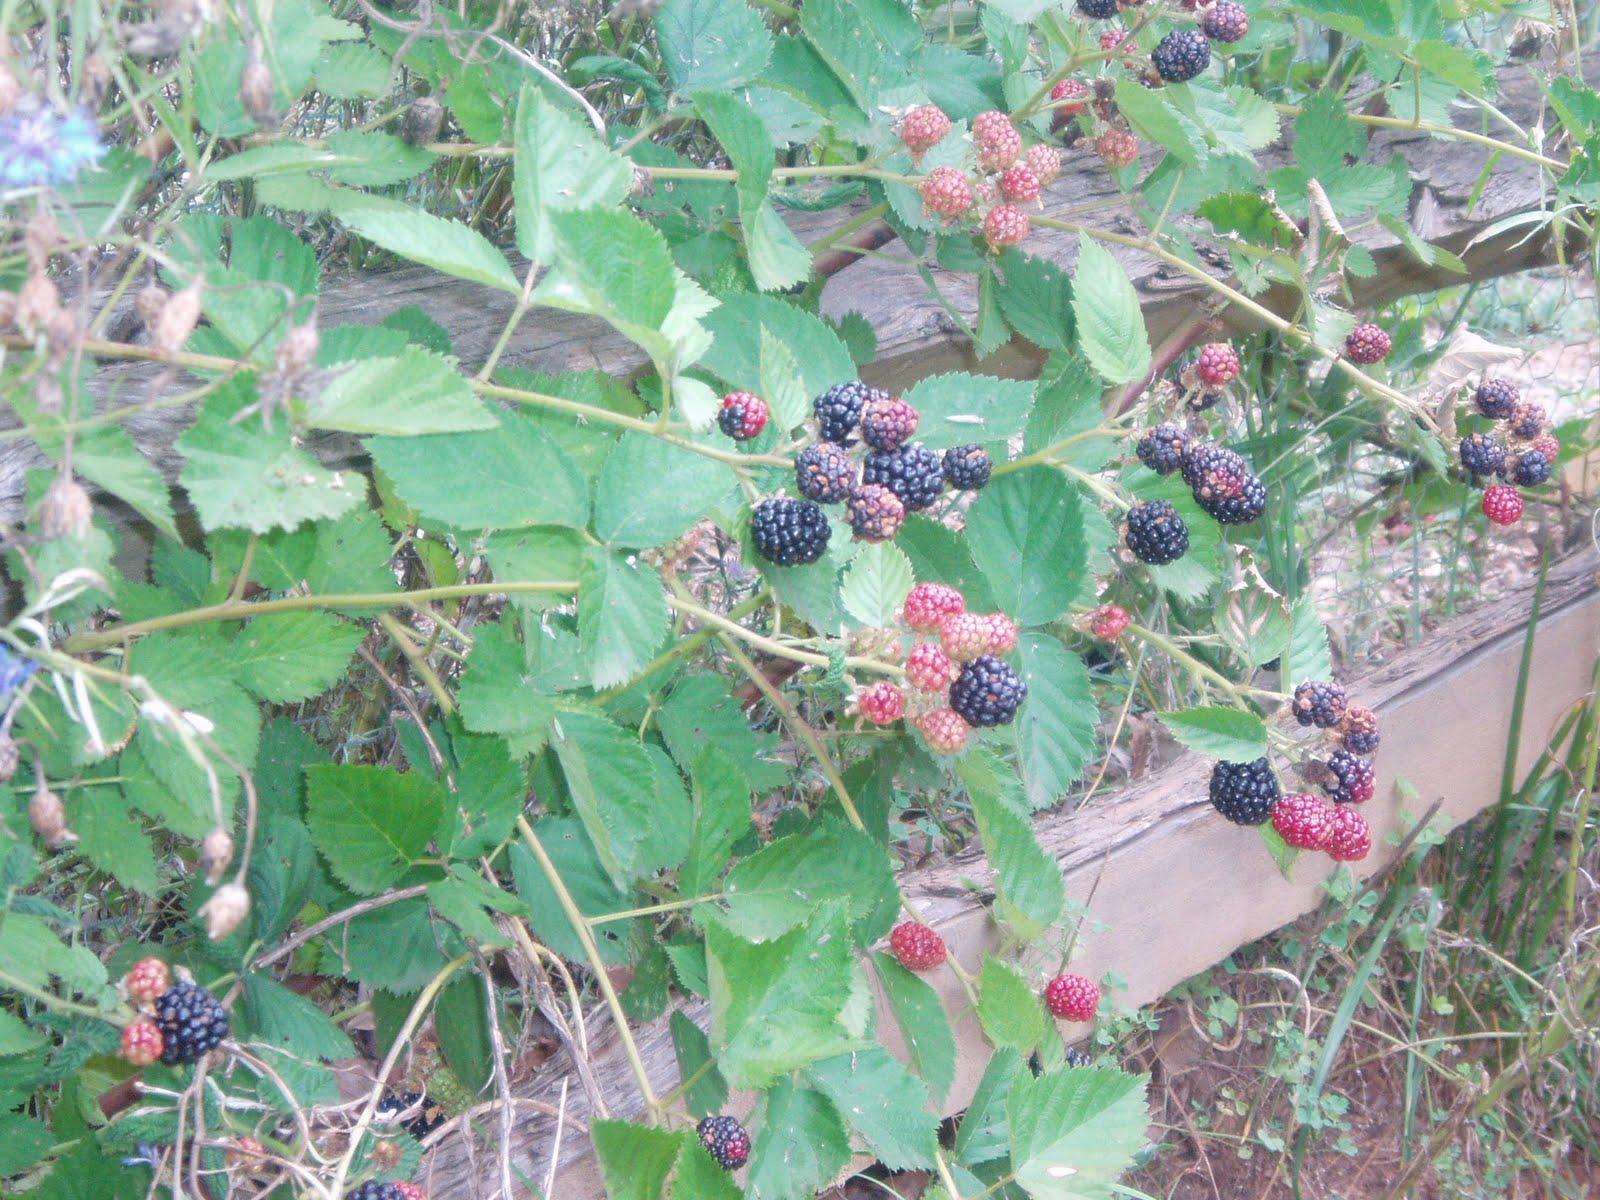 Blackberry Brambles Heavy with Fruit